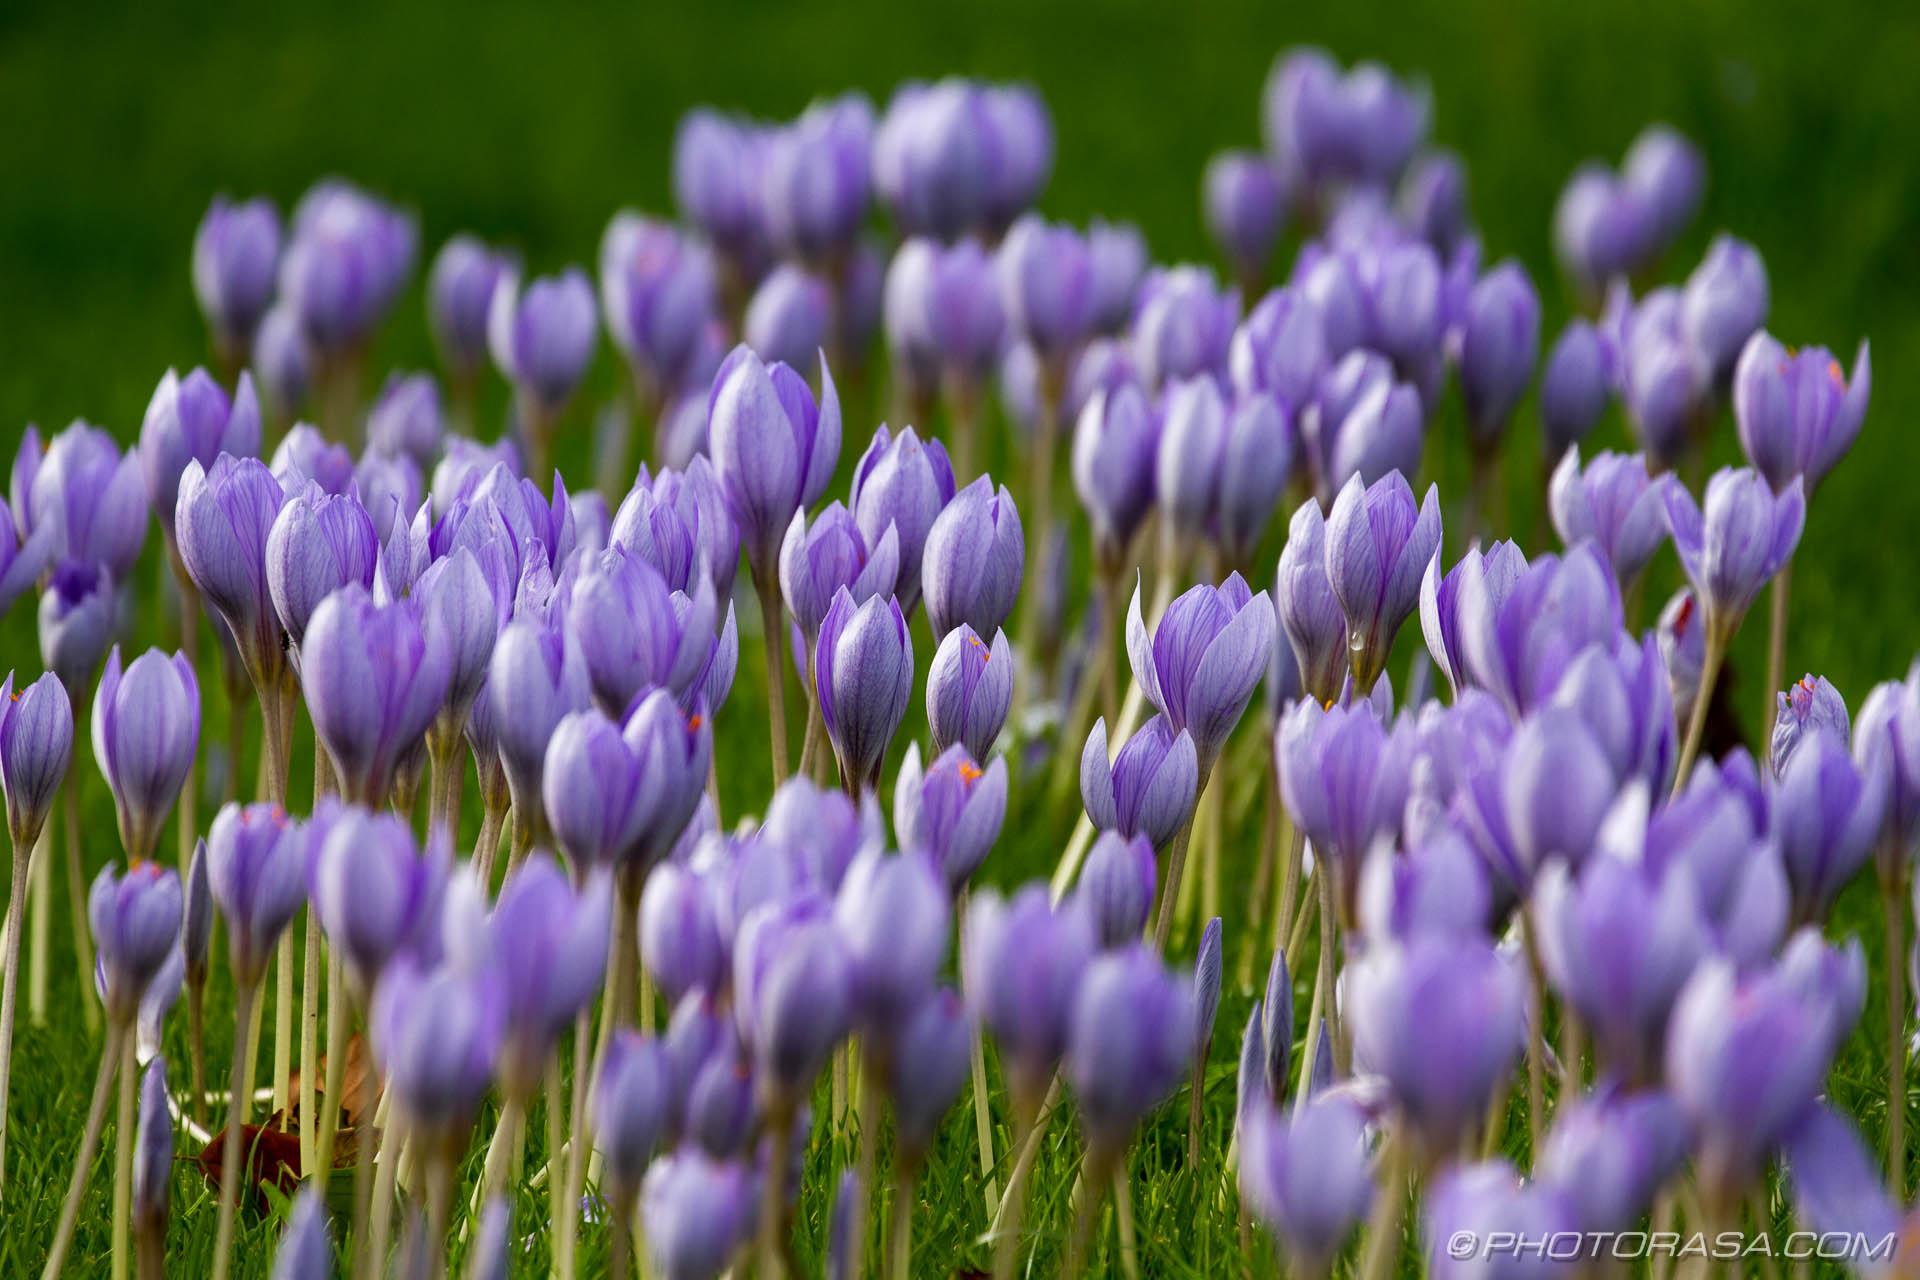 https://photorasa.com/purple-autumn-crocuses/large-flowering-of-purple-crocuses/